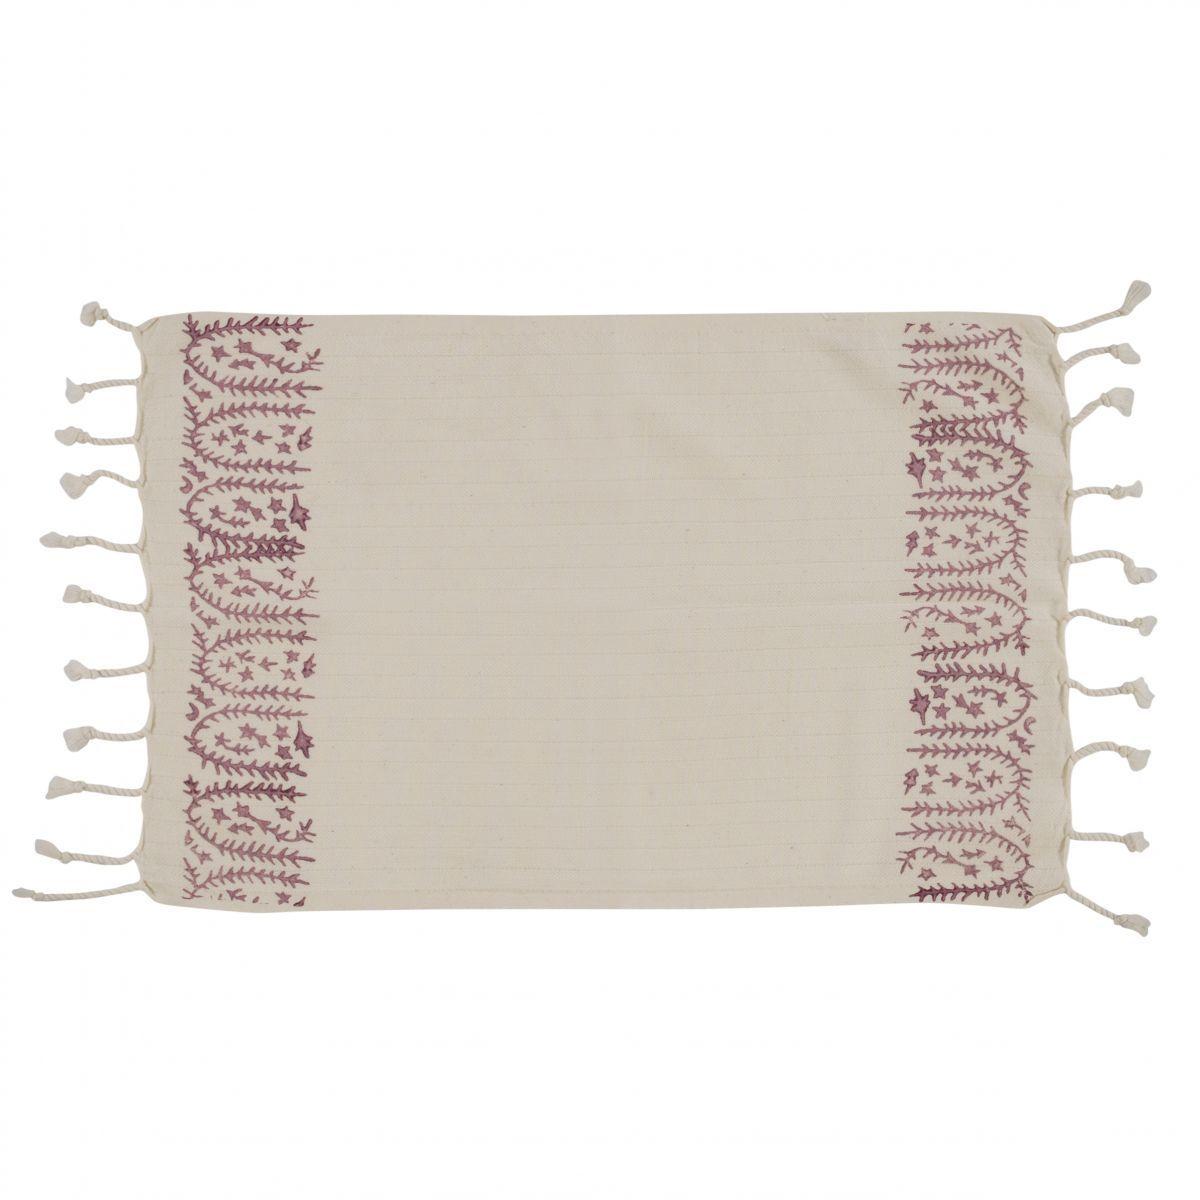 Peshkir Mini Towel - Hand Printed 01 / Dusty Rose (30x50)